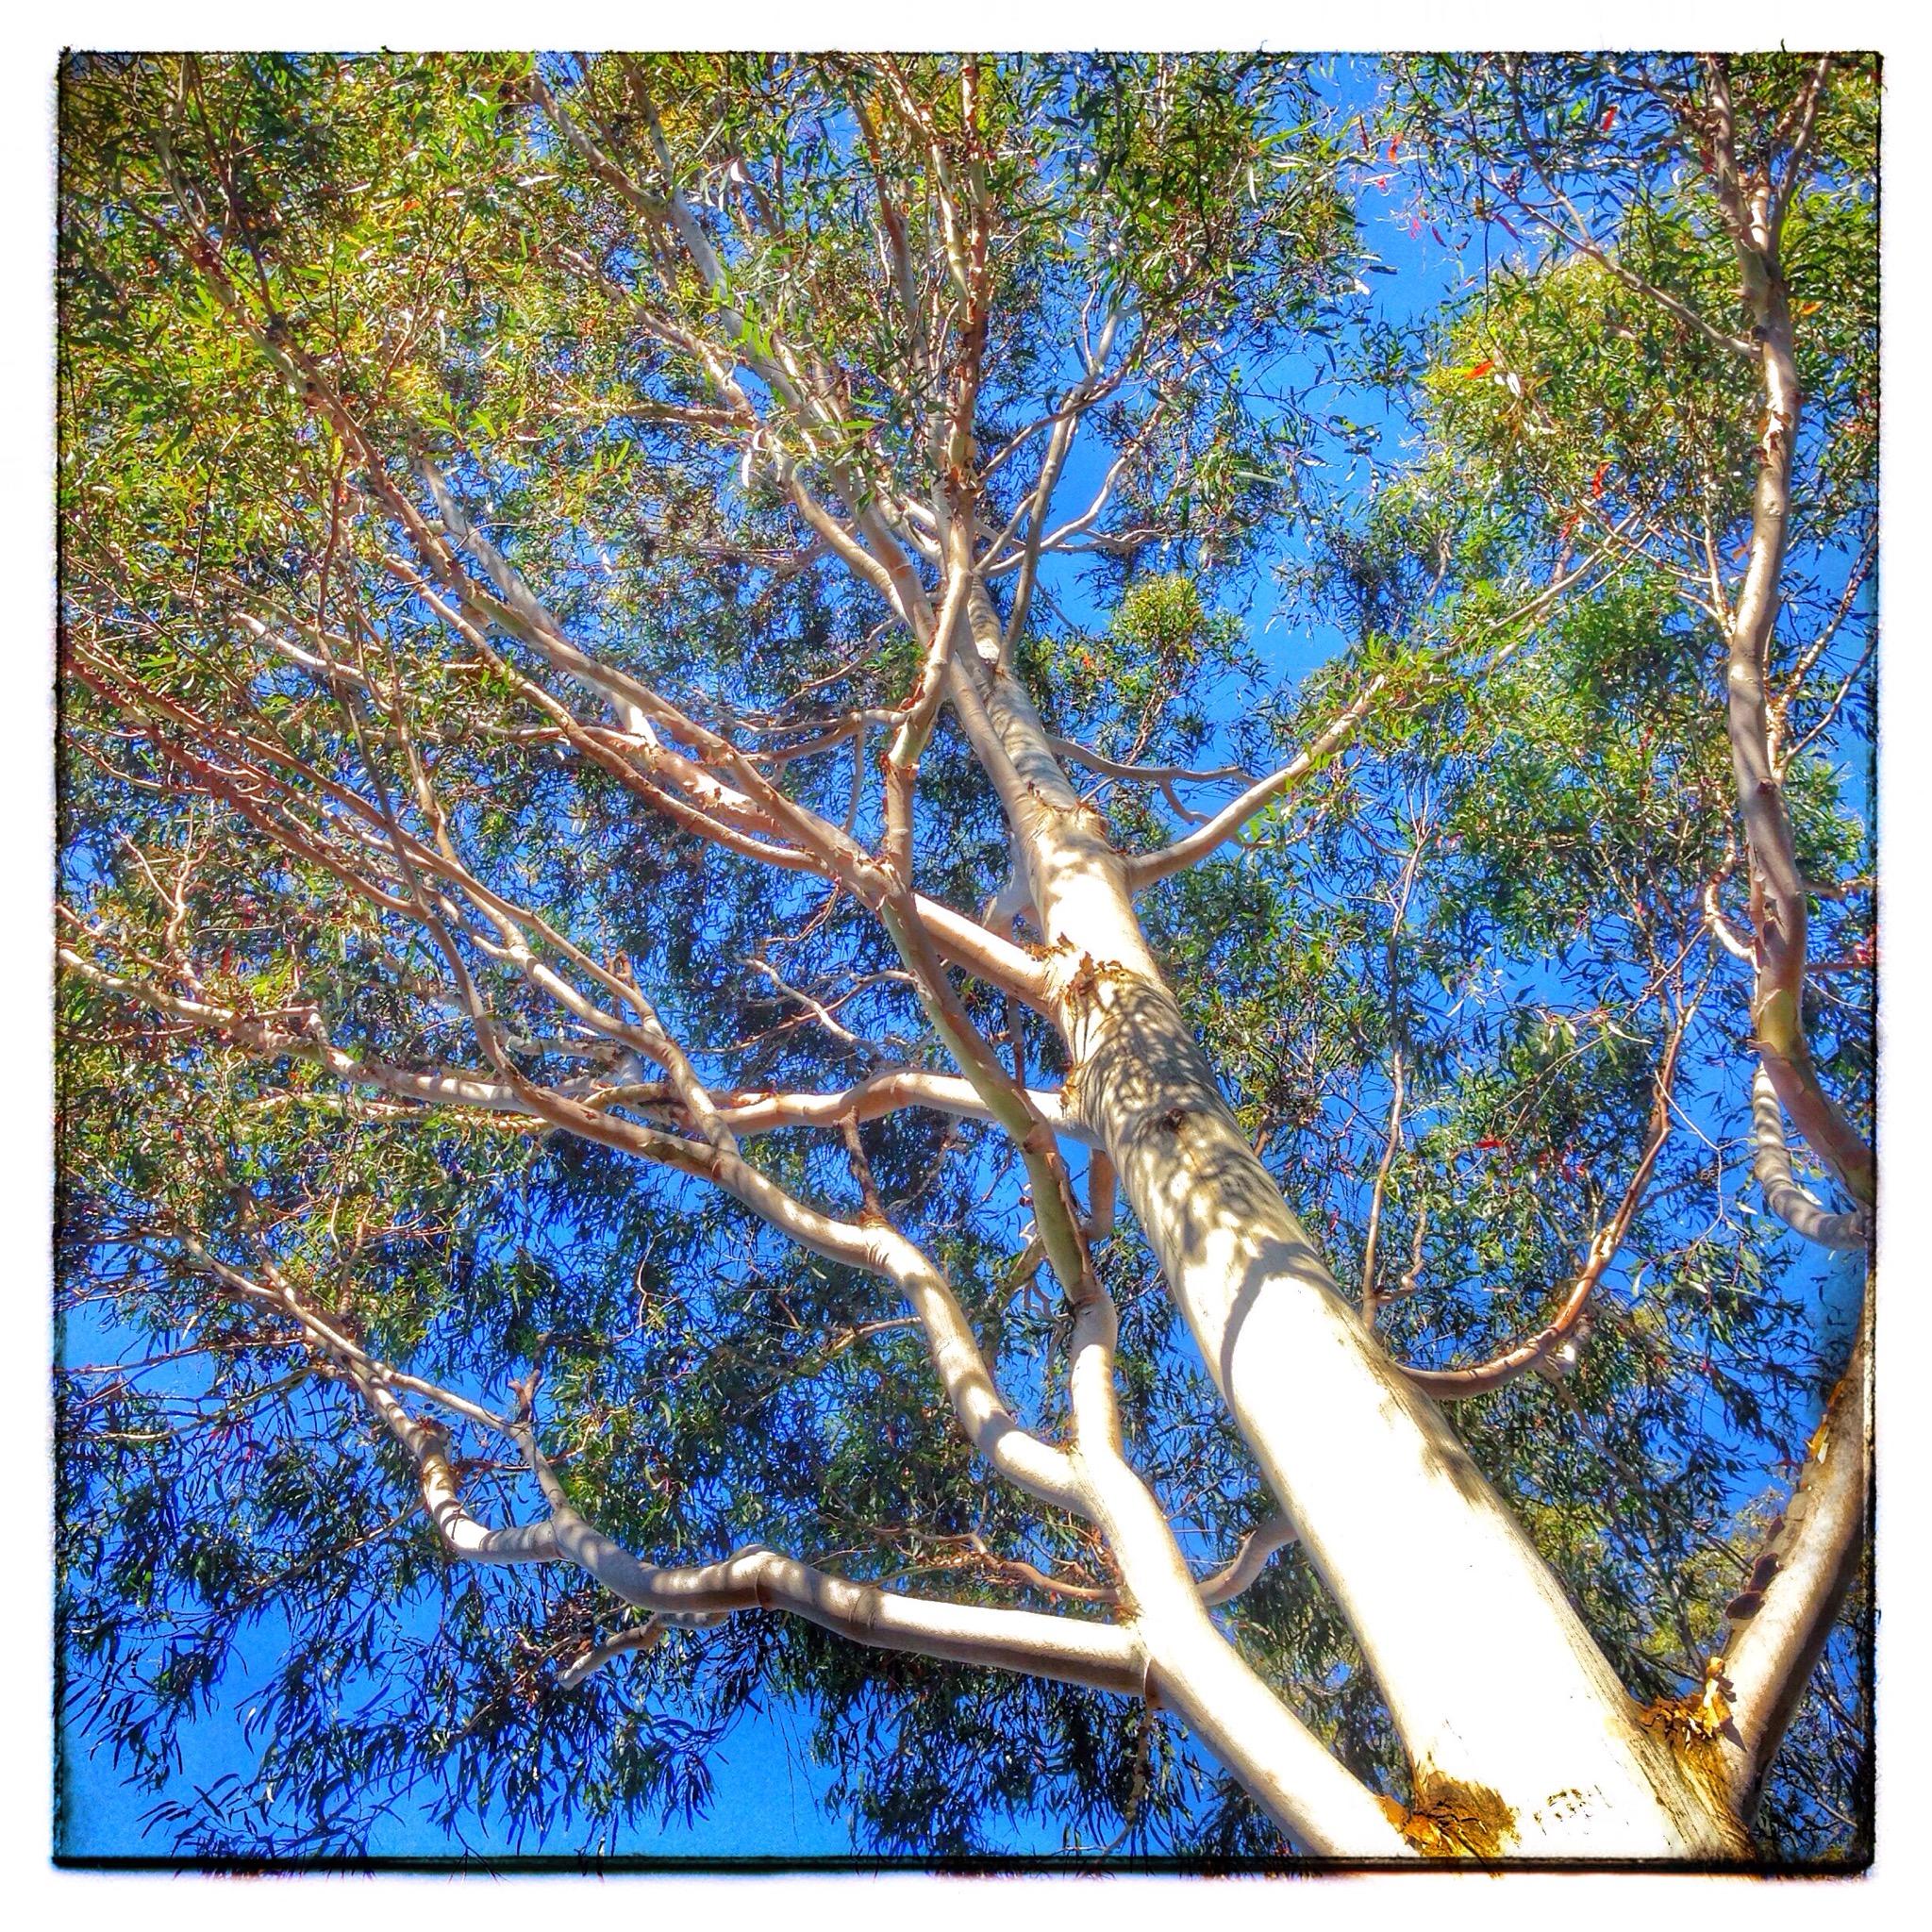 Day 1346. Tree